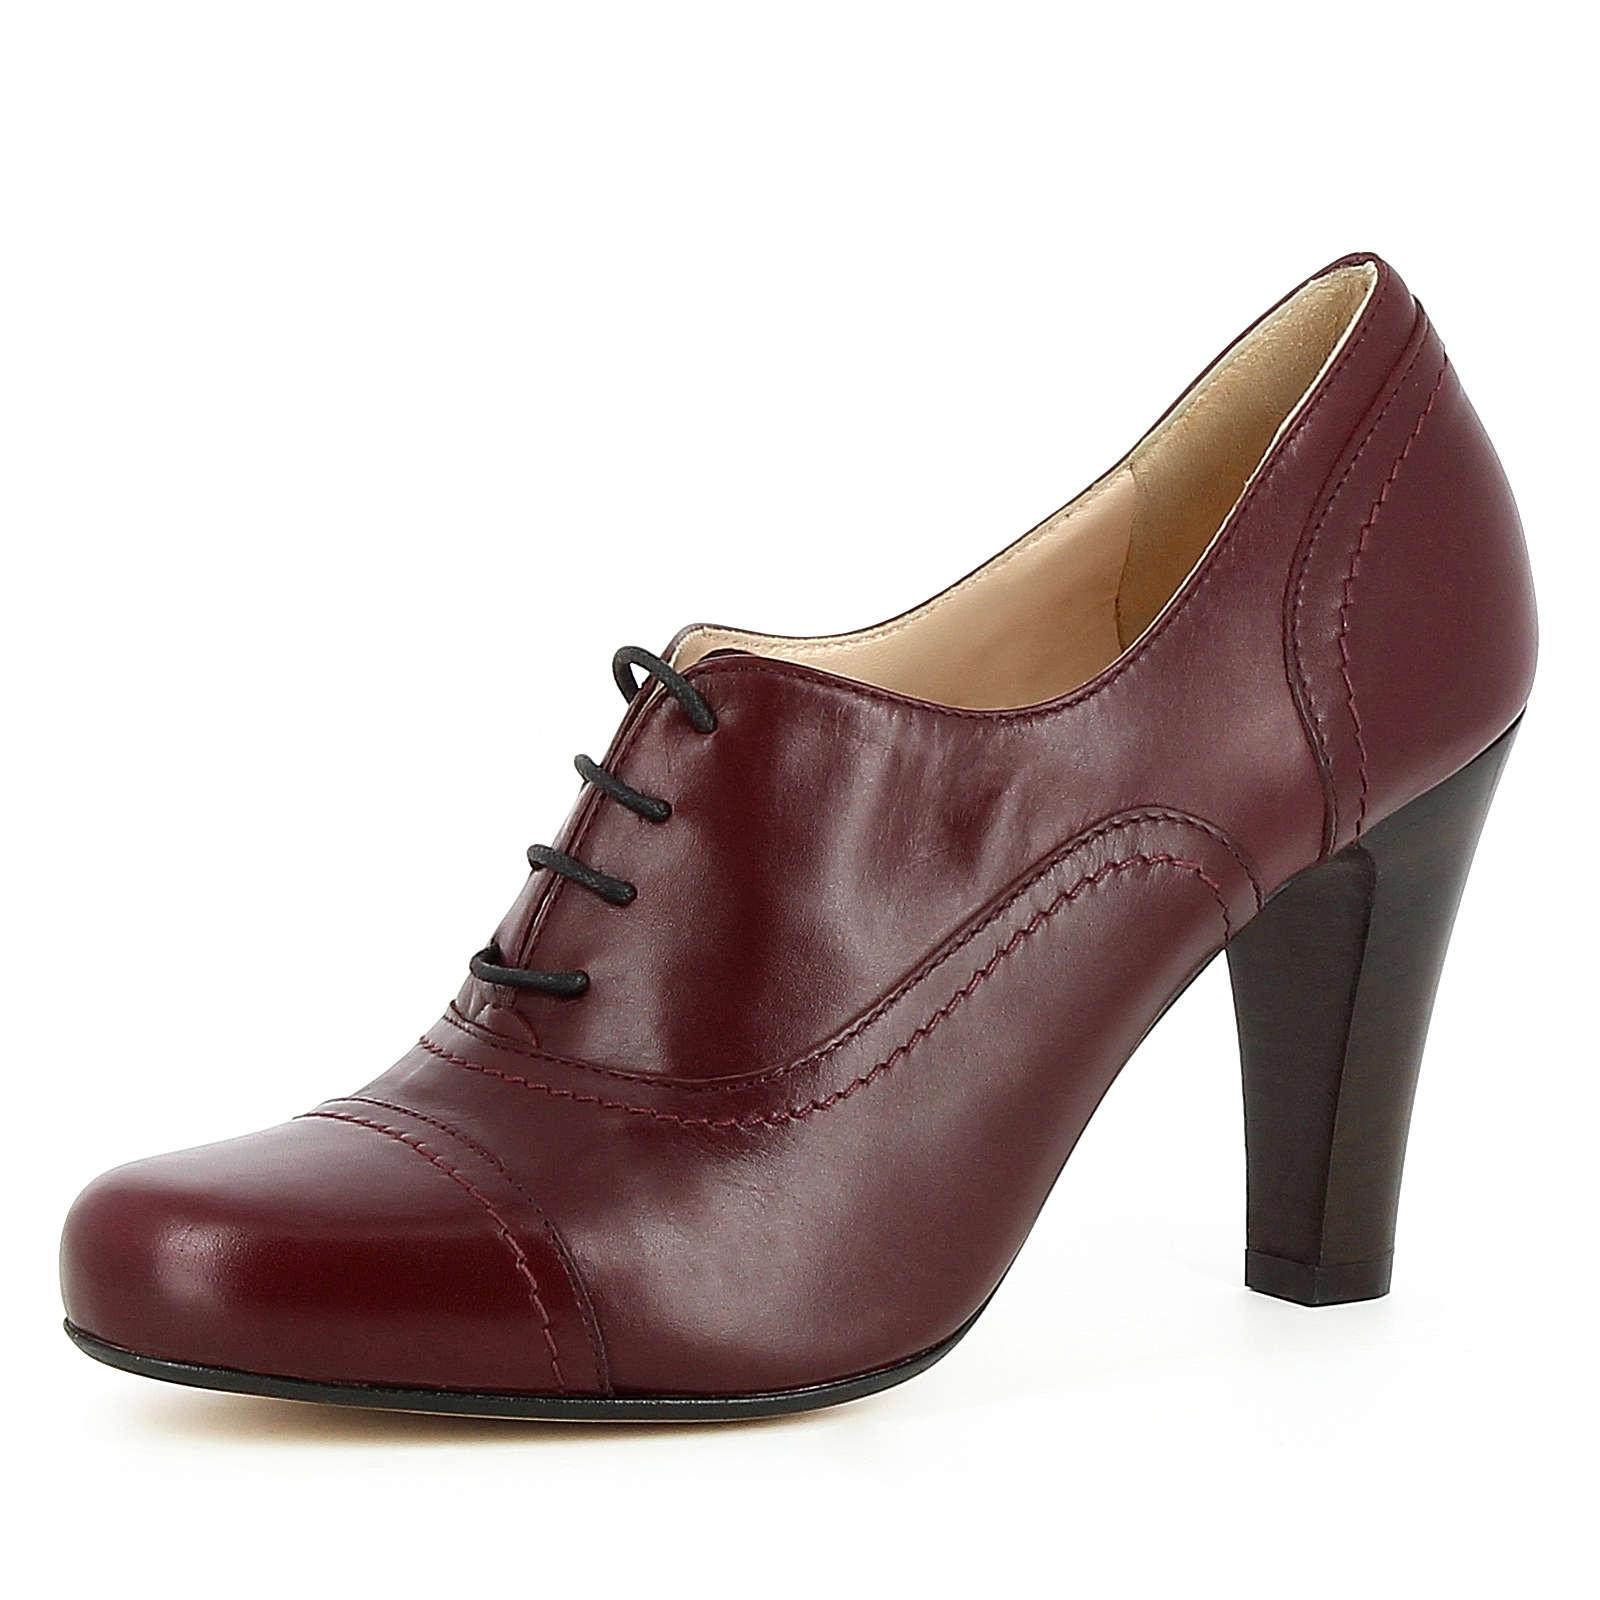 Evita Shoes Damen Pumps MARIA Schnürpumps bordeaux Damen Gr. 38